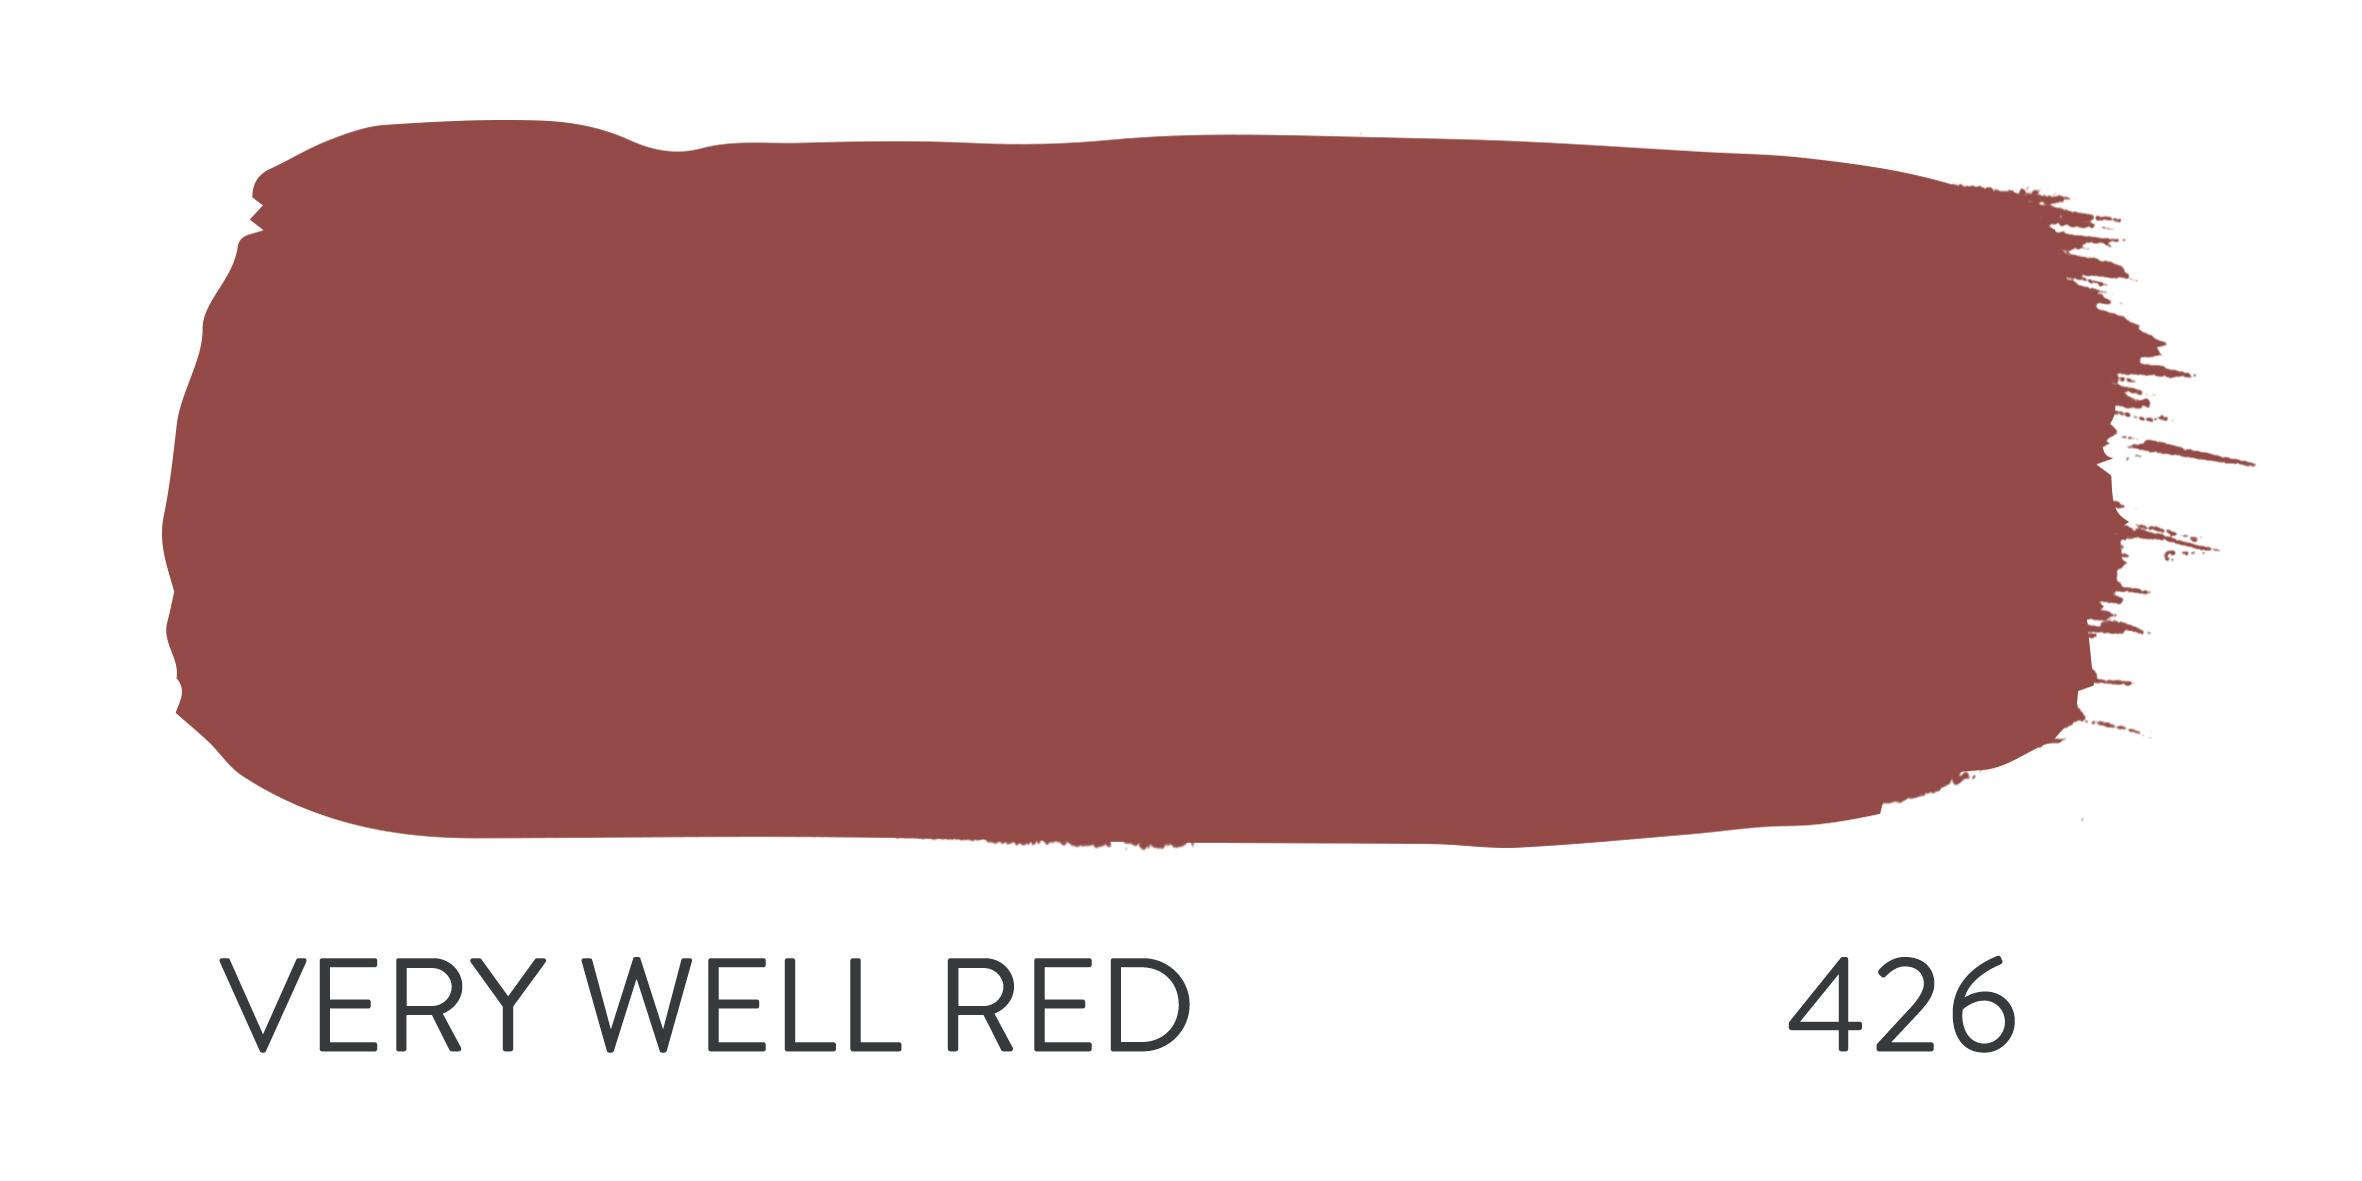 VERY WELL RED 426.jpg